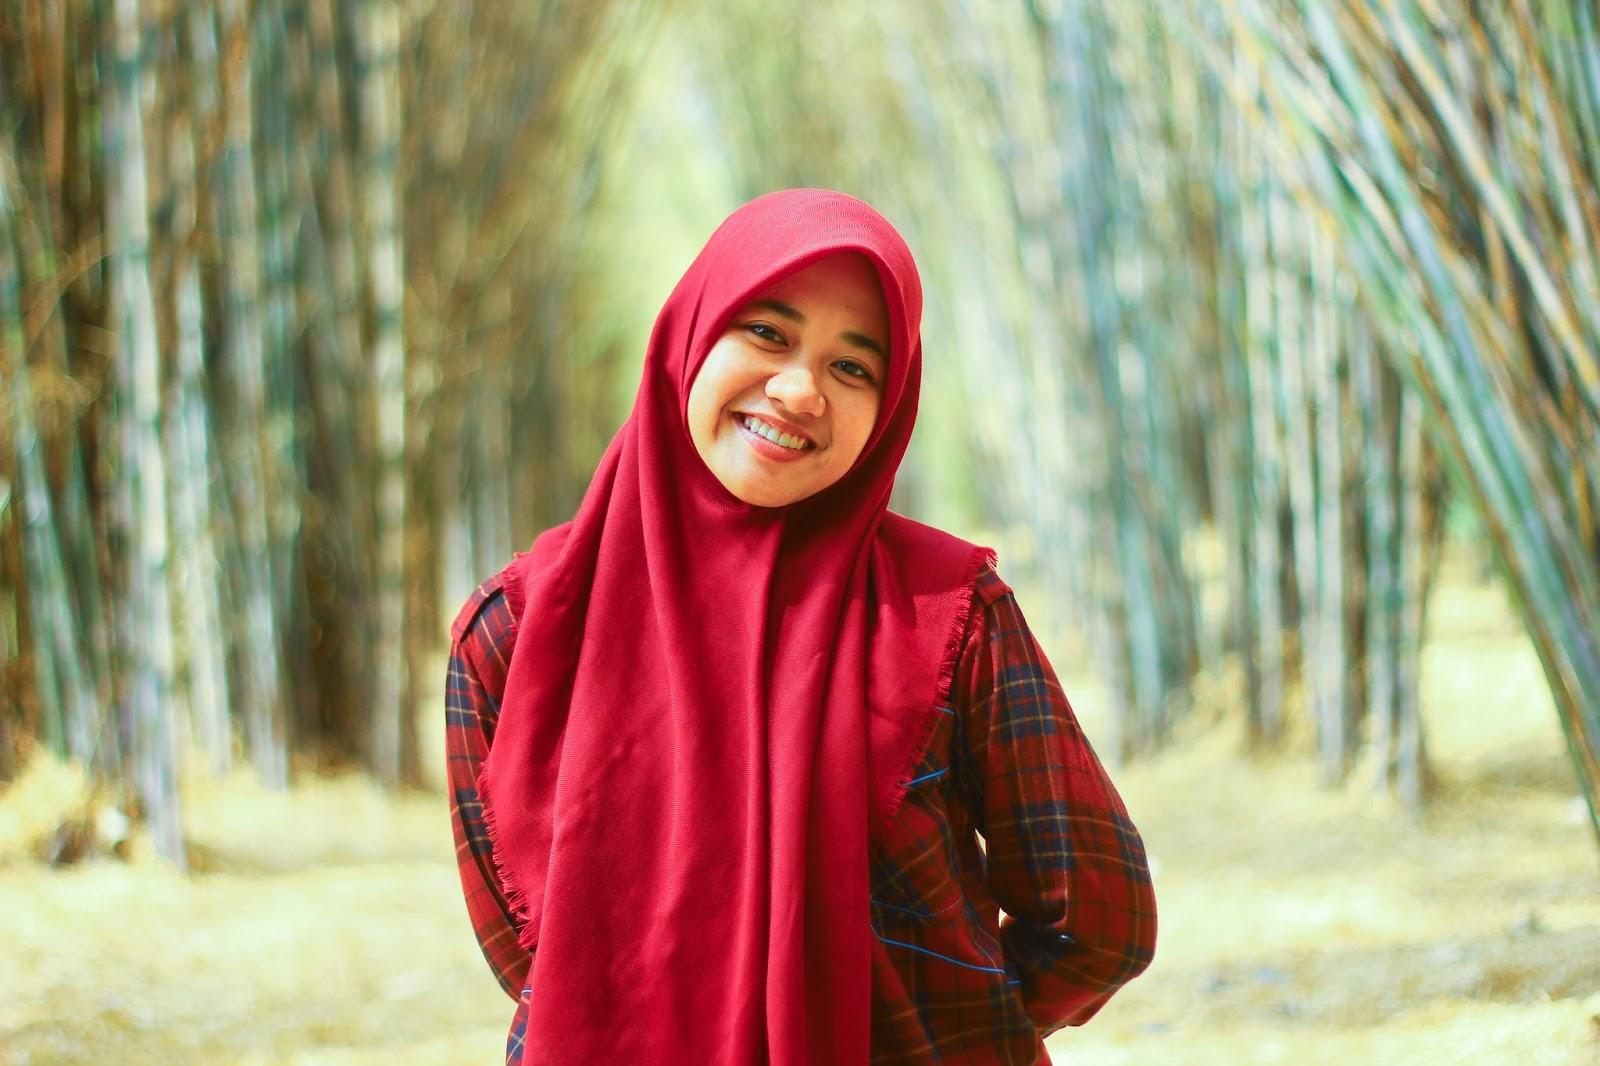 Taman Sakura Hutan Bambu Keputih Siluet Senja Kota Surabaya